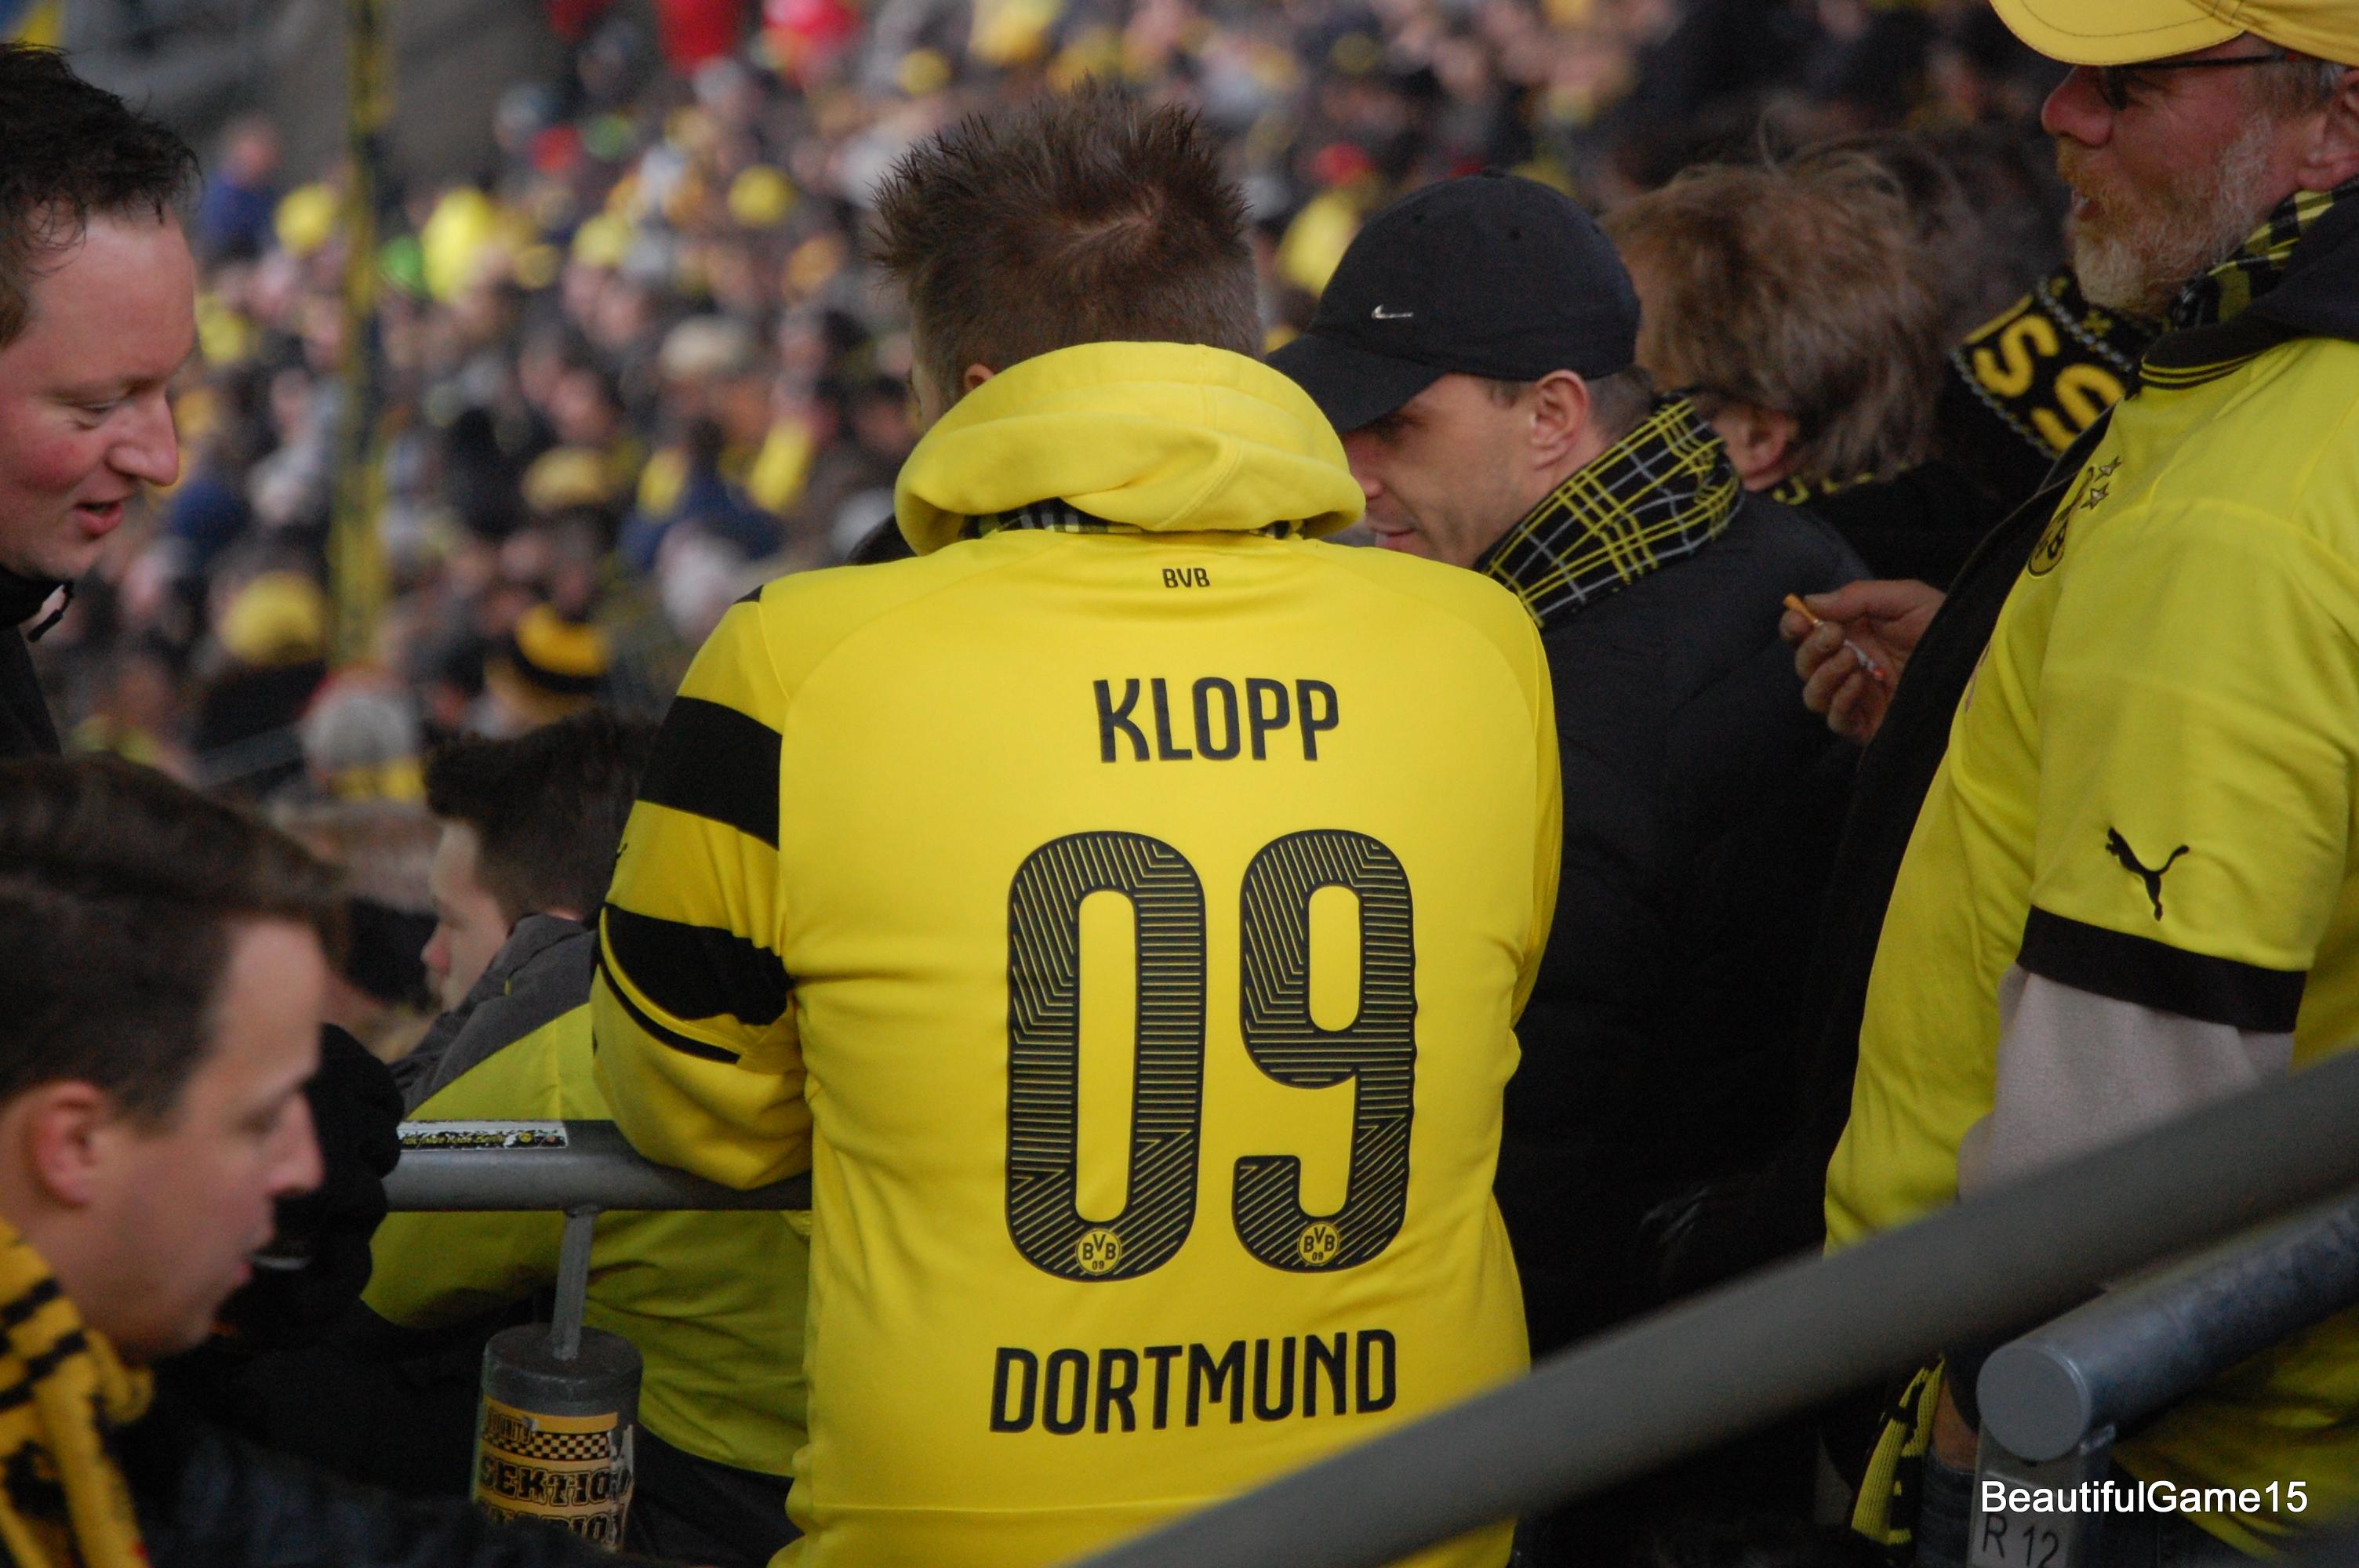 Südtribüne - Borussia Dortmund v TSG 1899 Hoffenheim - Part Two